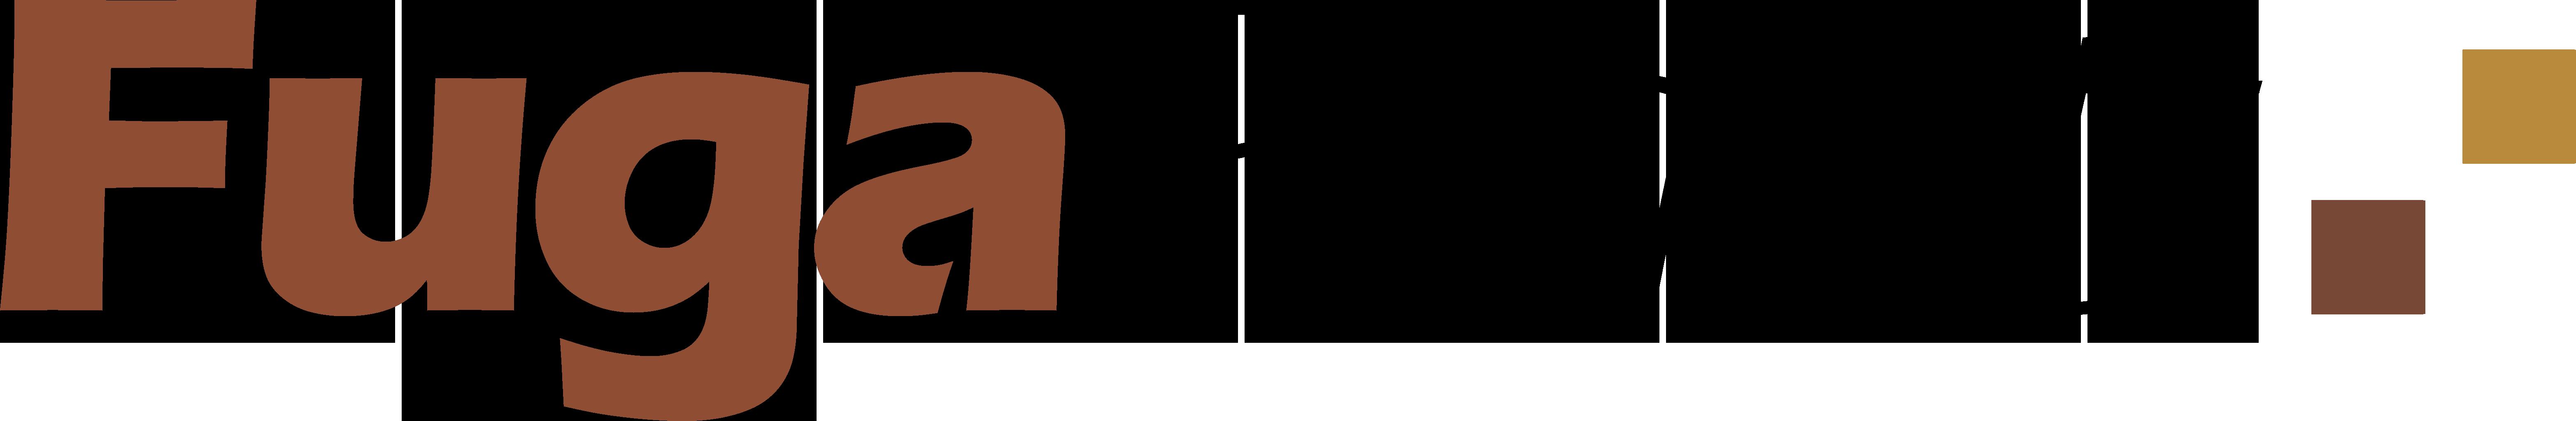 Fuga Parkett GmbH Logo